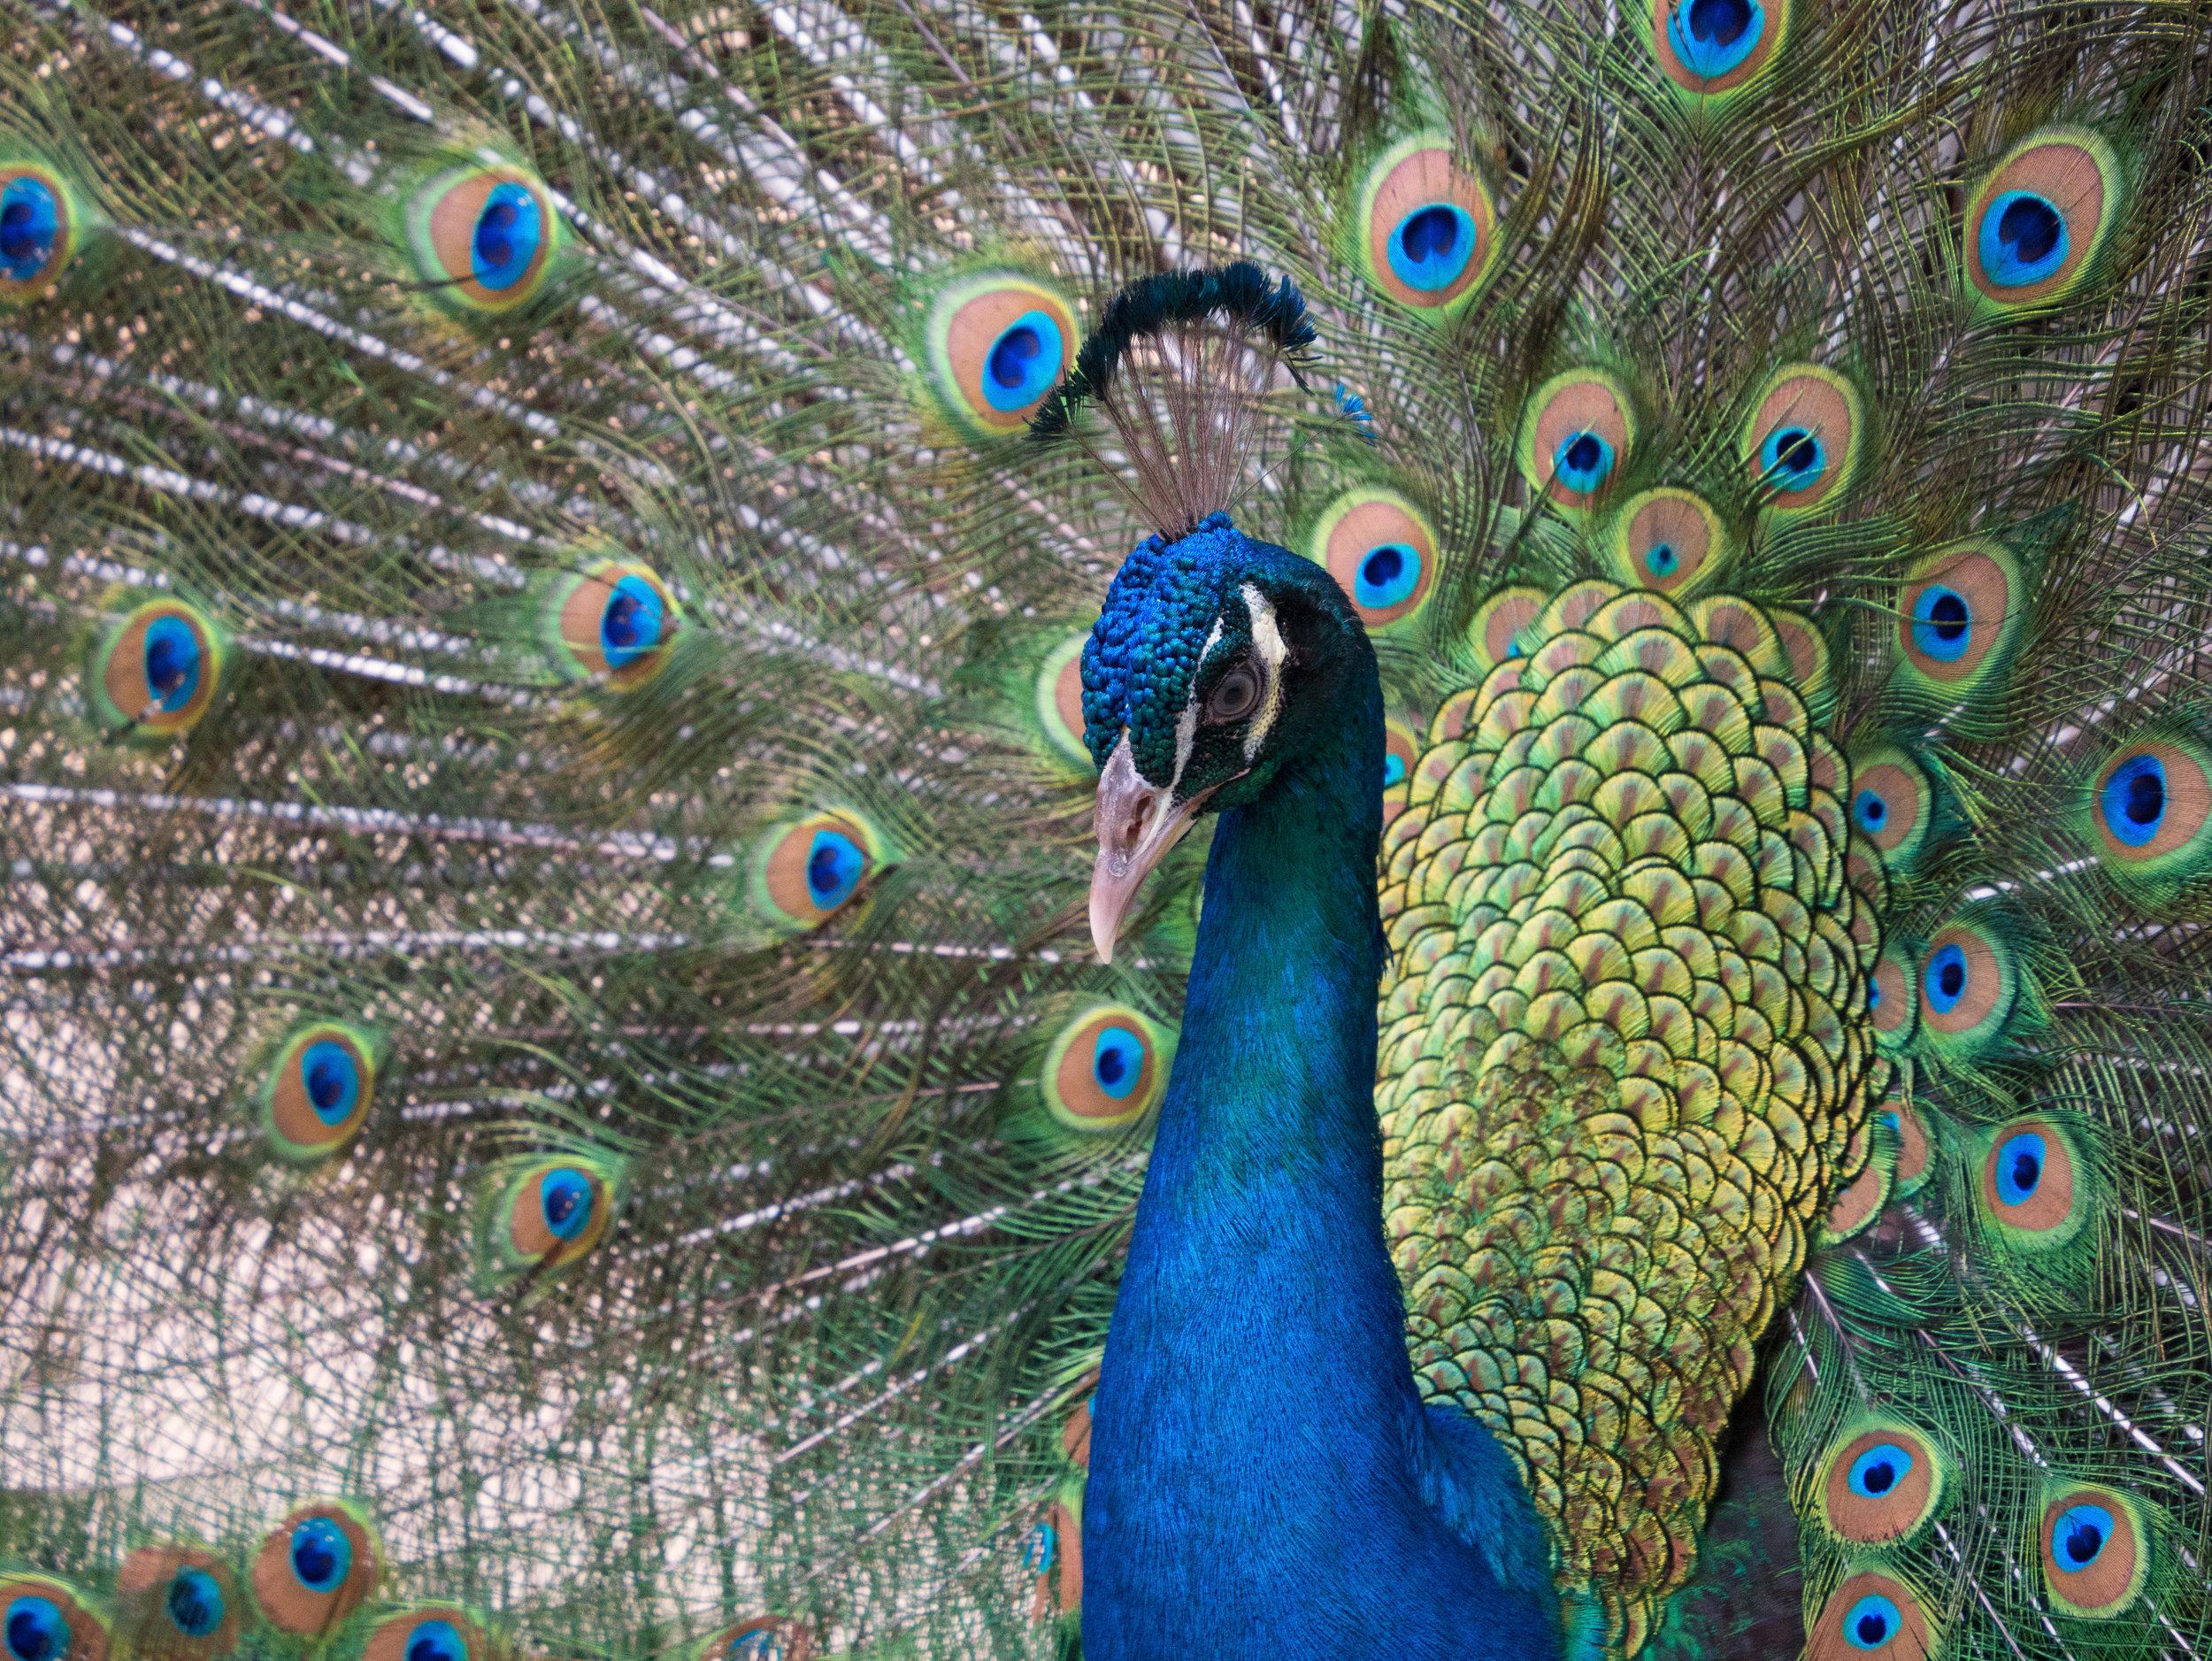 Mexican Peacock-4592 x 3448.jpg